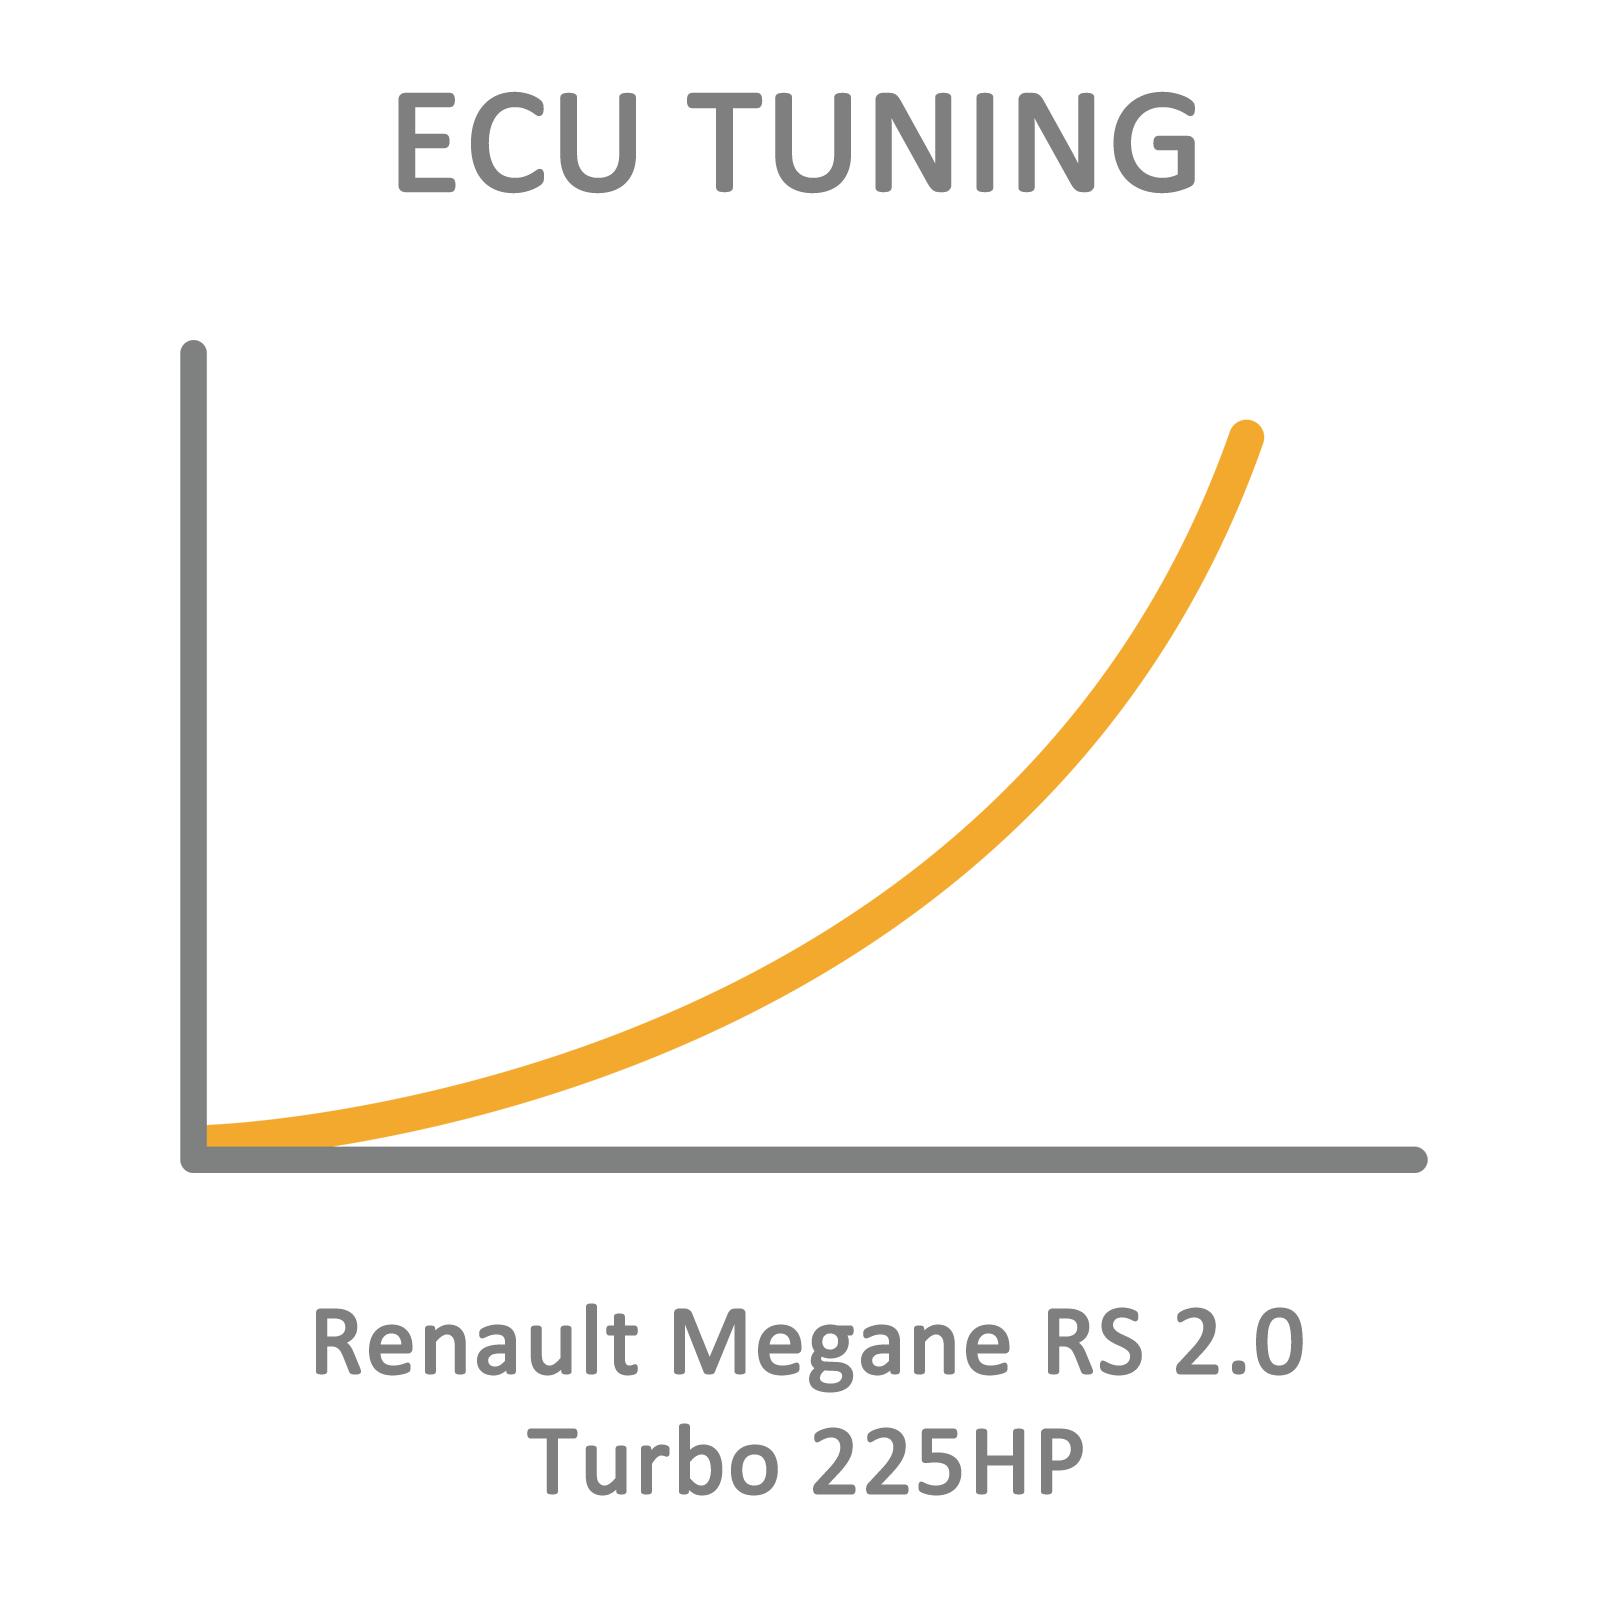 Renault Megane RS 2.0 Turbo 225HP ECU Tuning Remapping